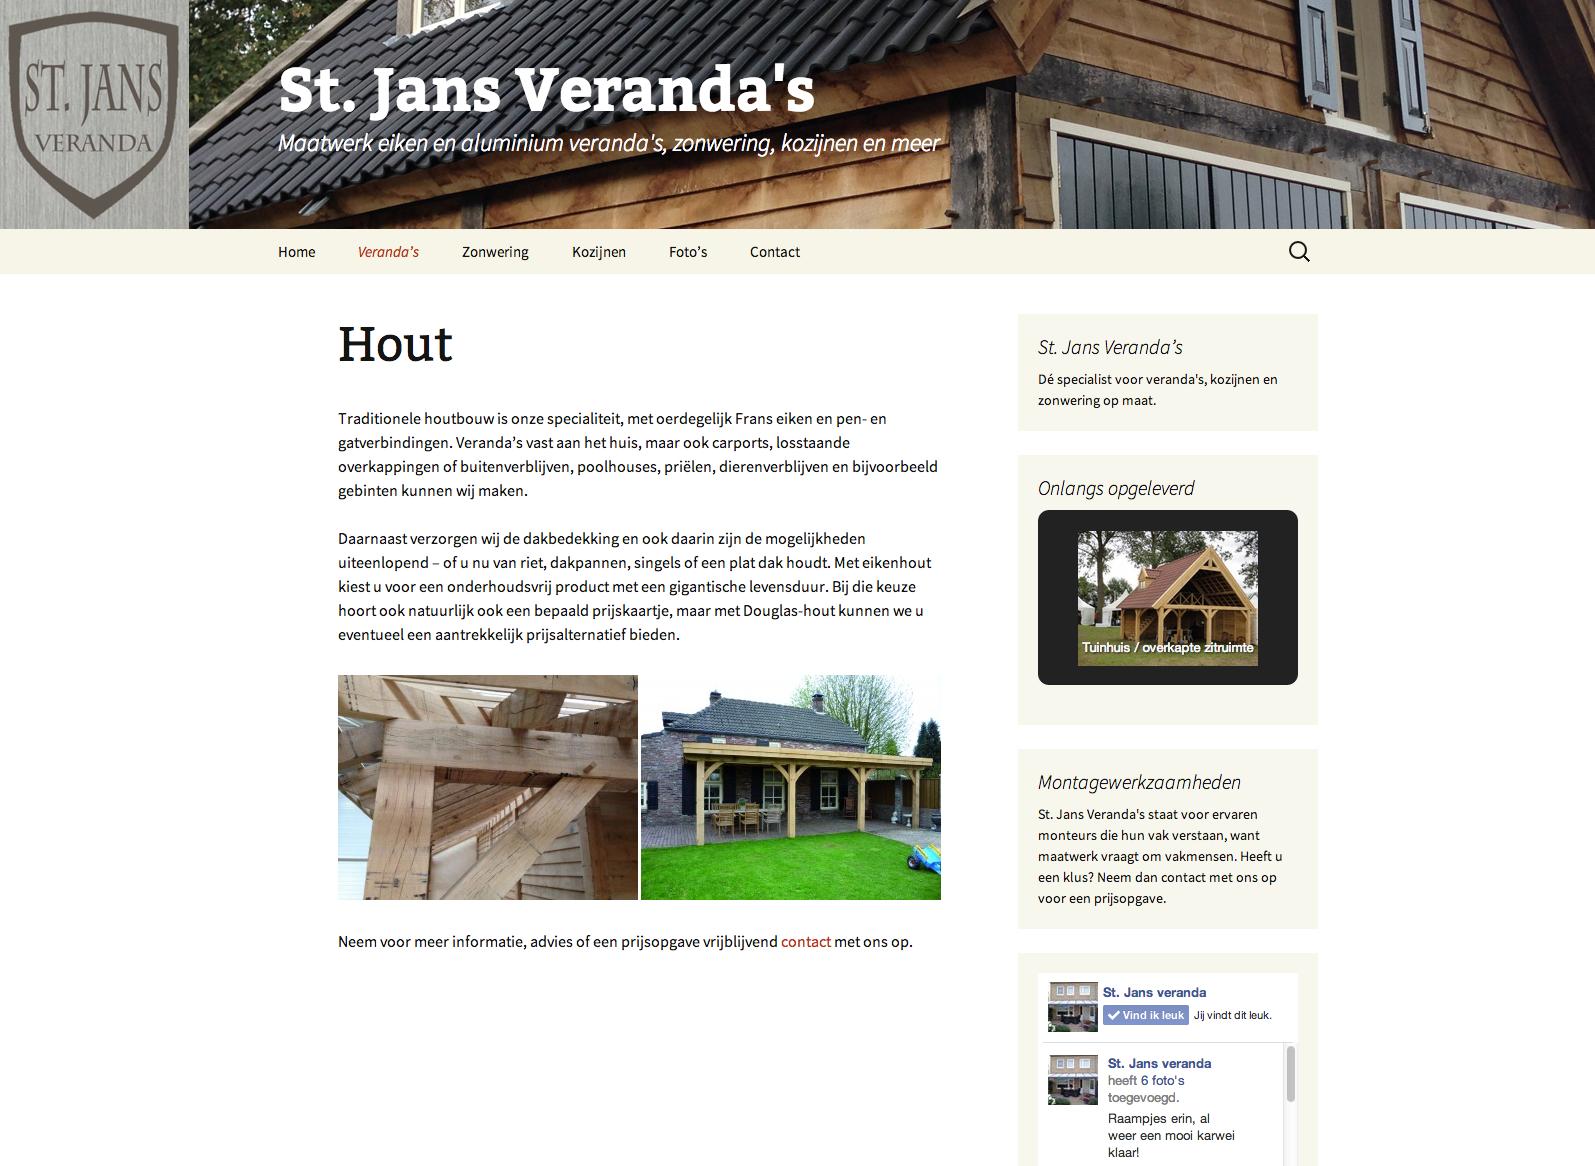 St. Jans Veranda's - website